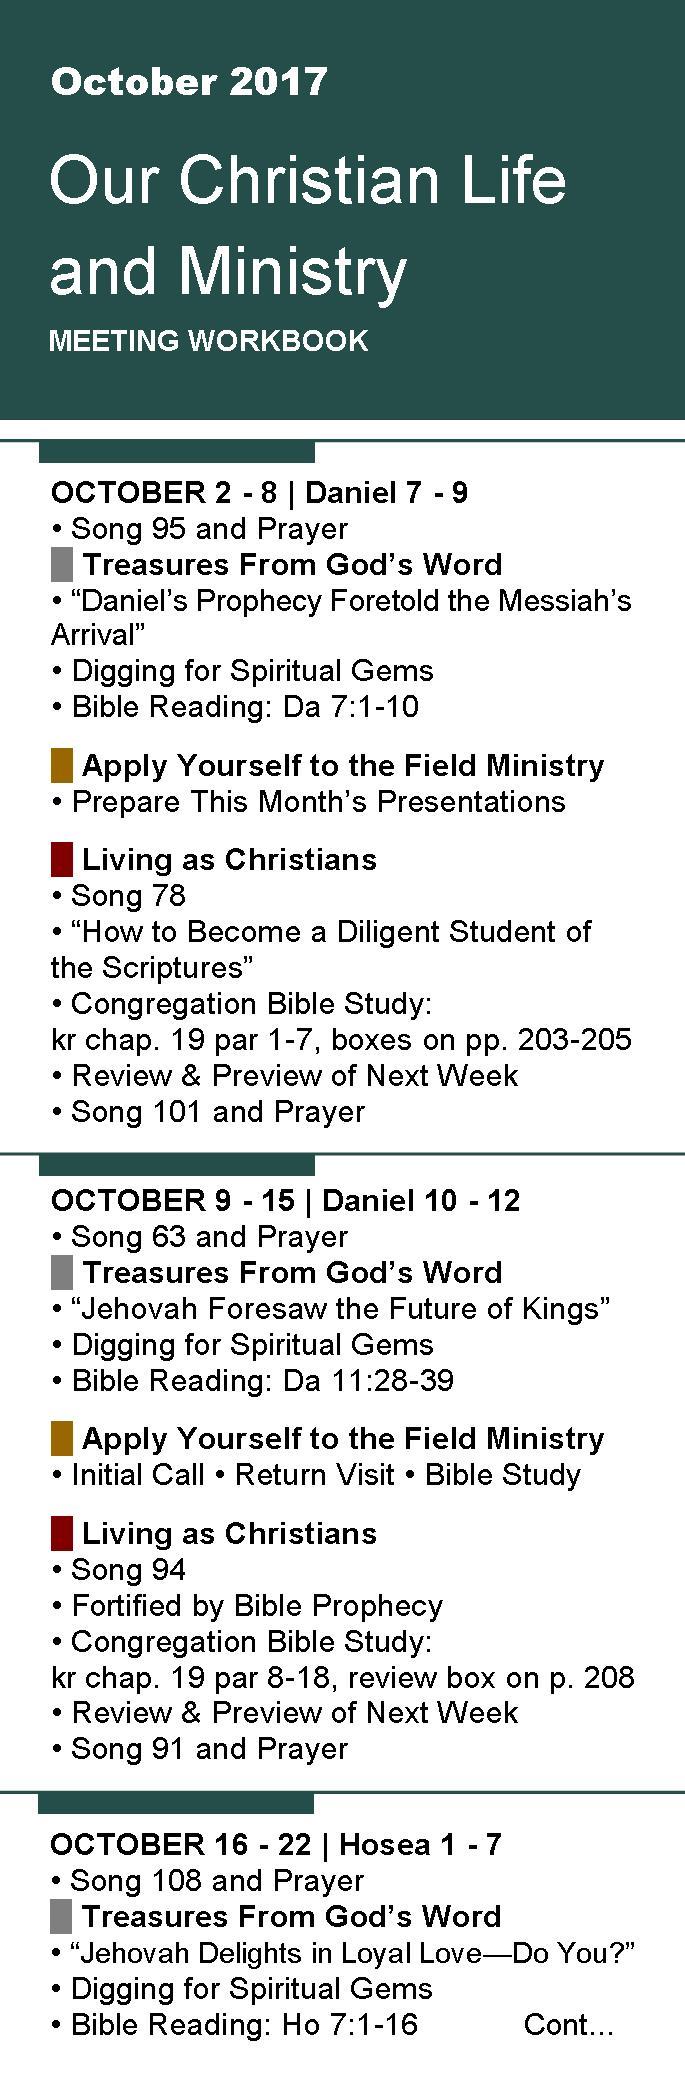 Workbooks prayer workbook : Free Bookmarks for Meeting Workbook October 2017 - Items voor ...